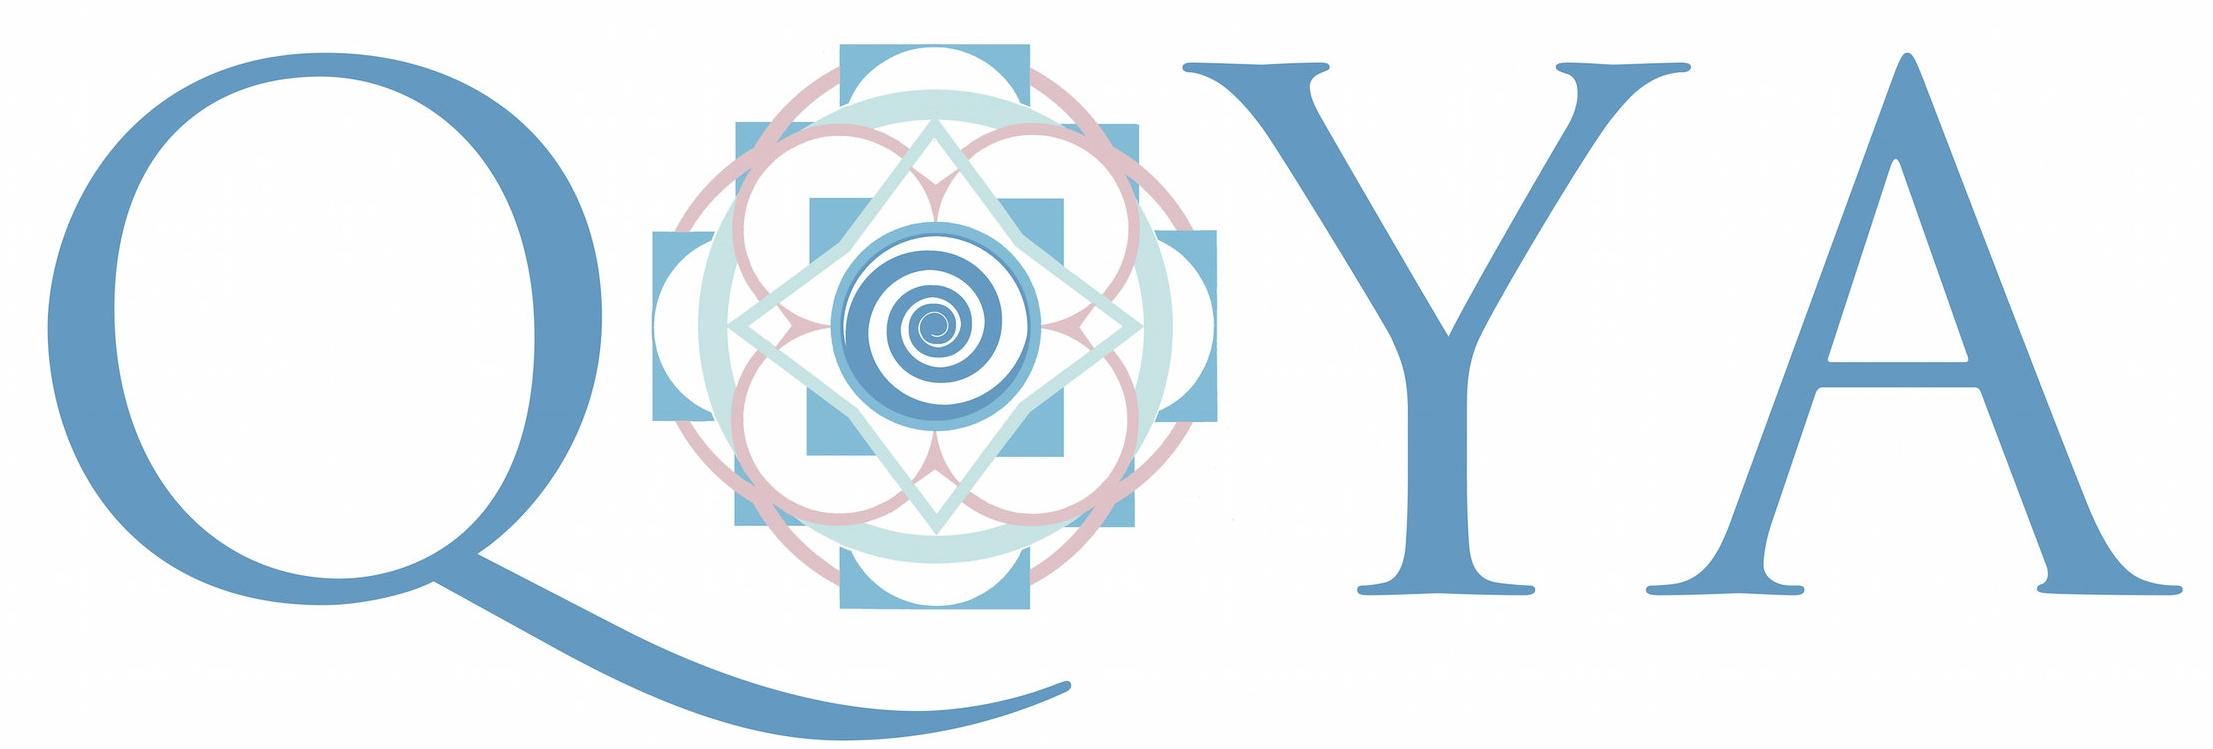 qoya-final-logo.jpg